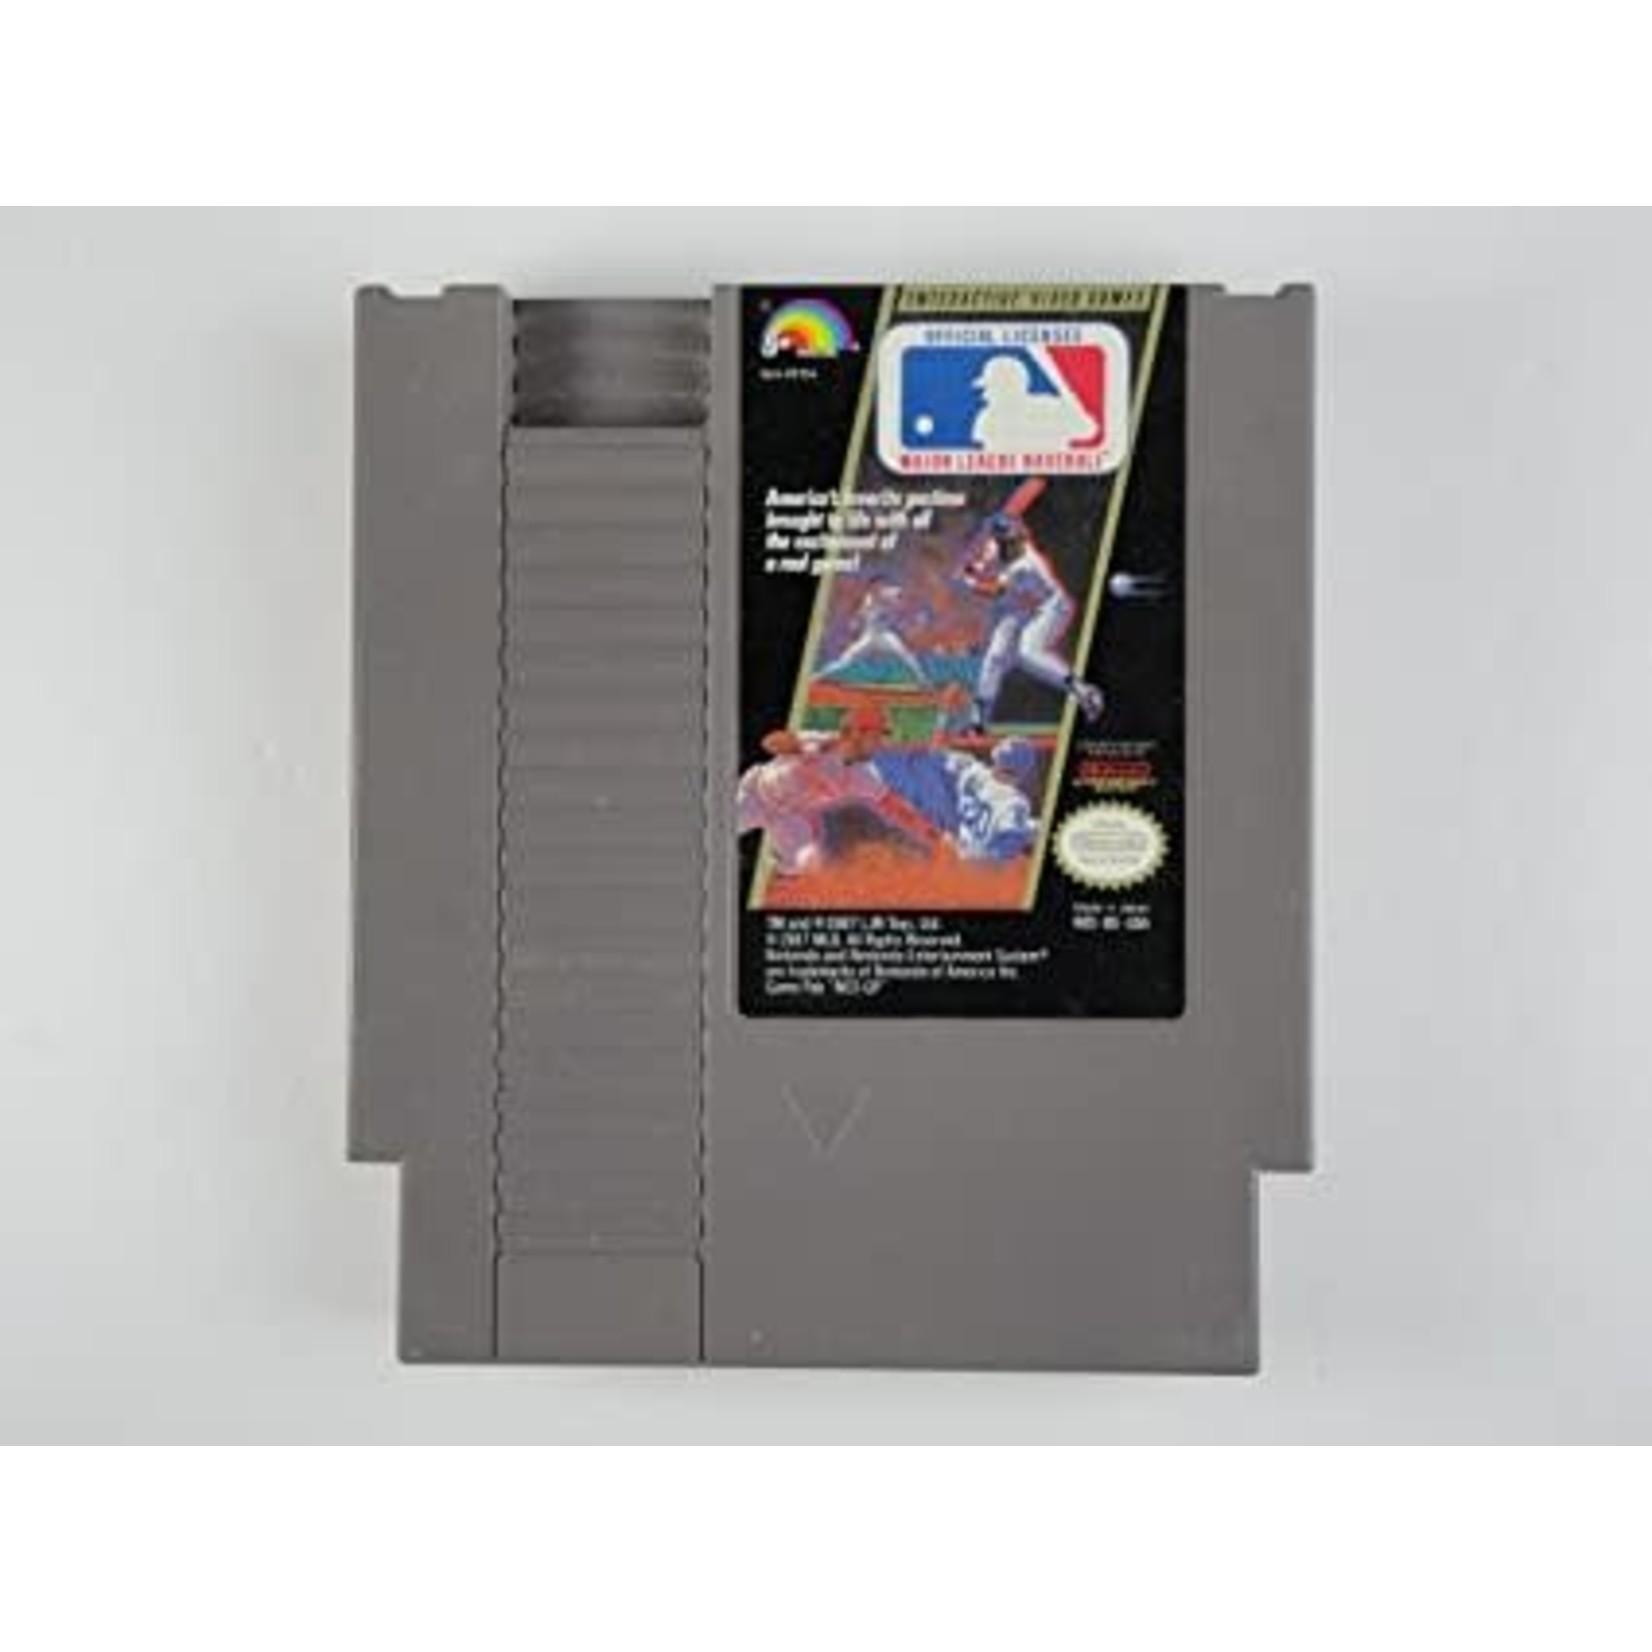 nesu-MLB (cartridge)